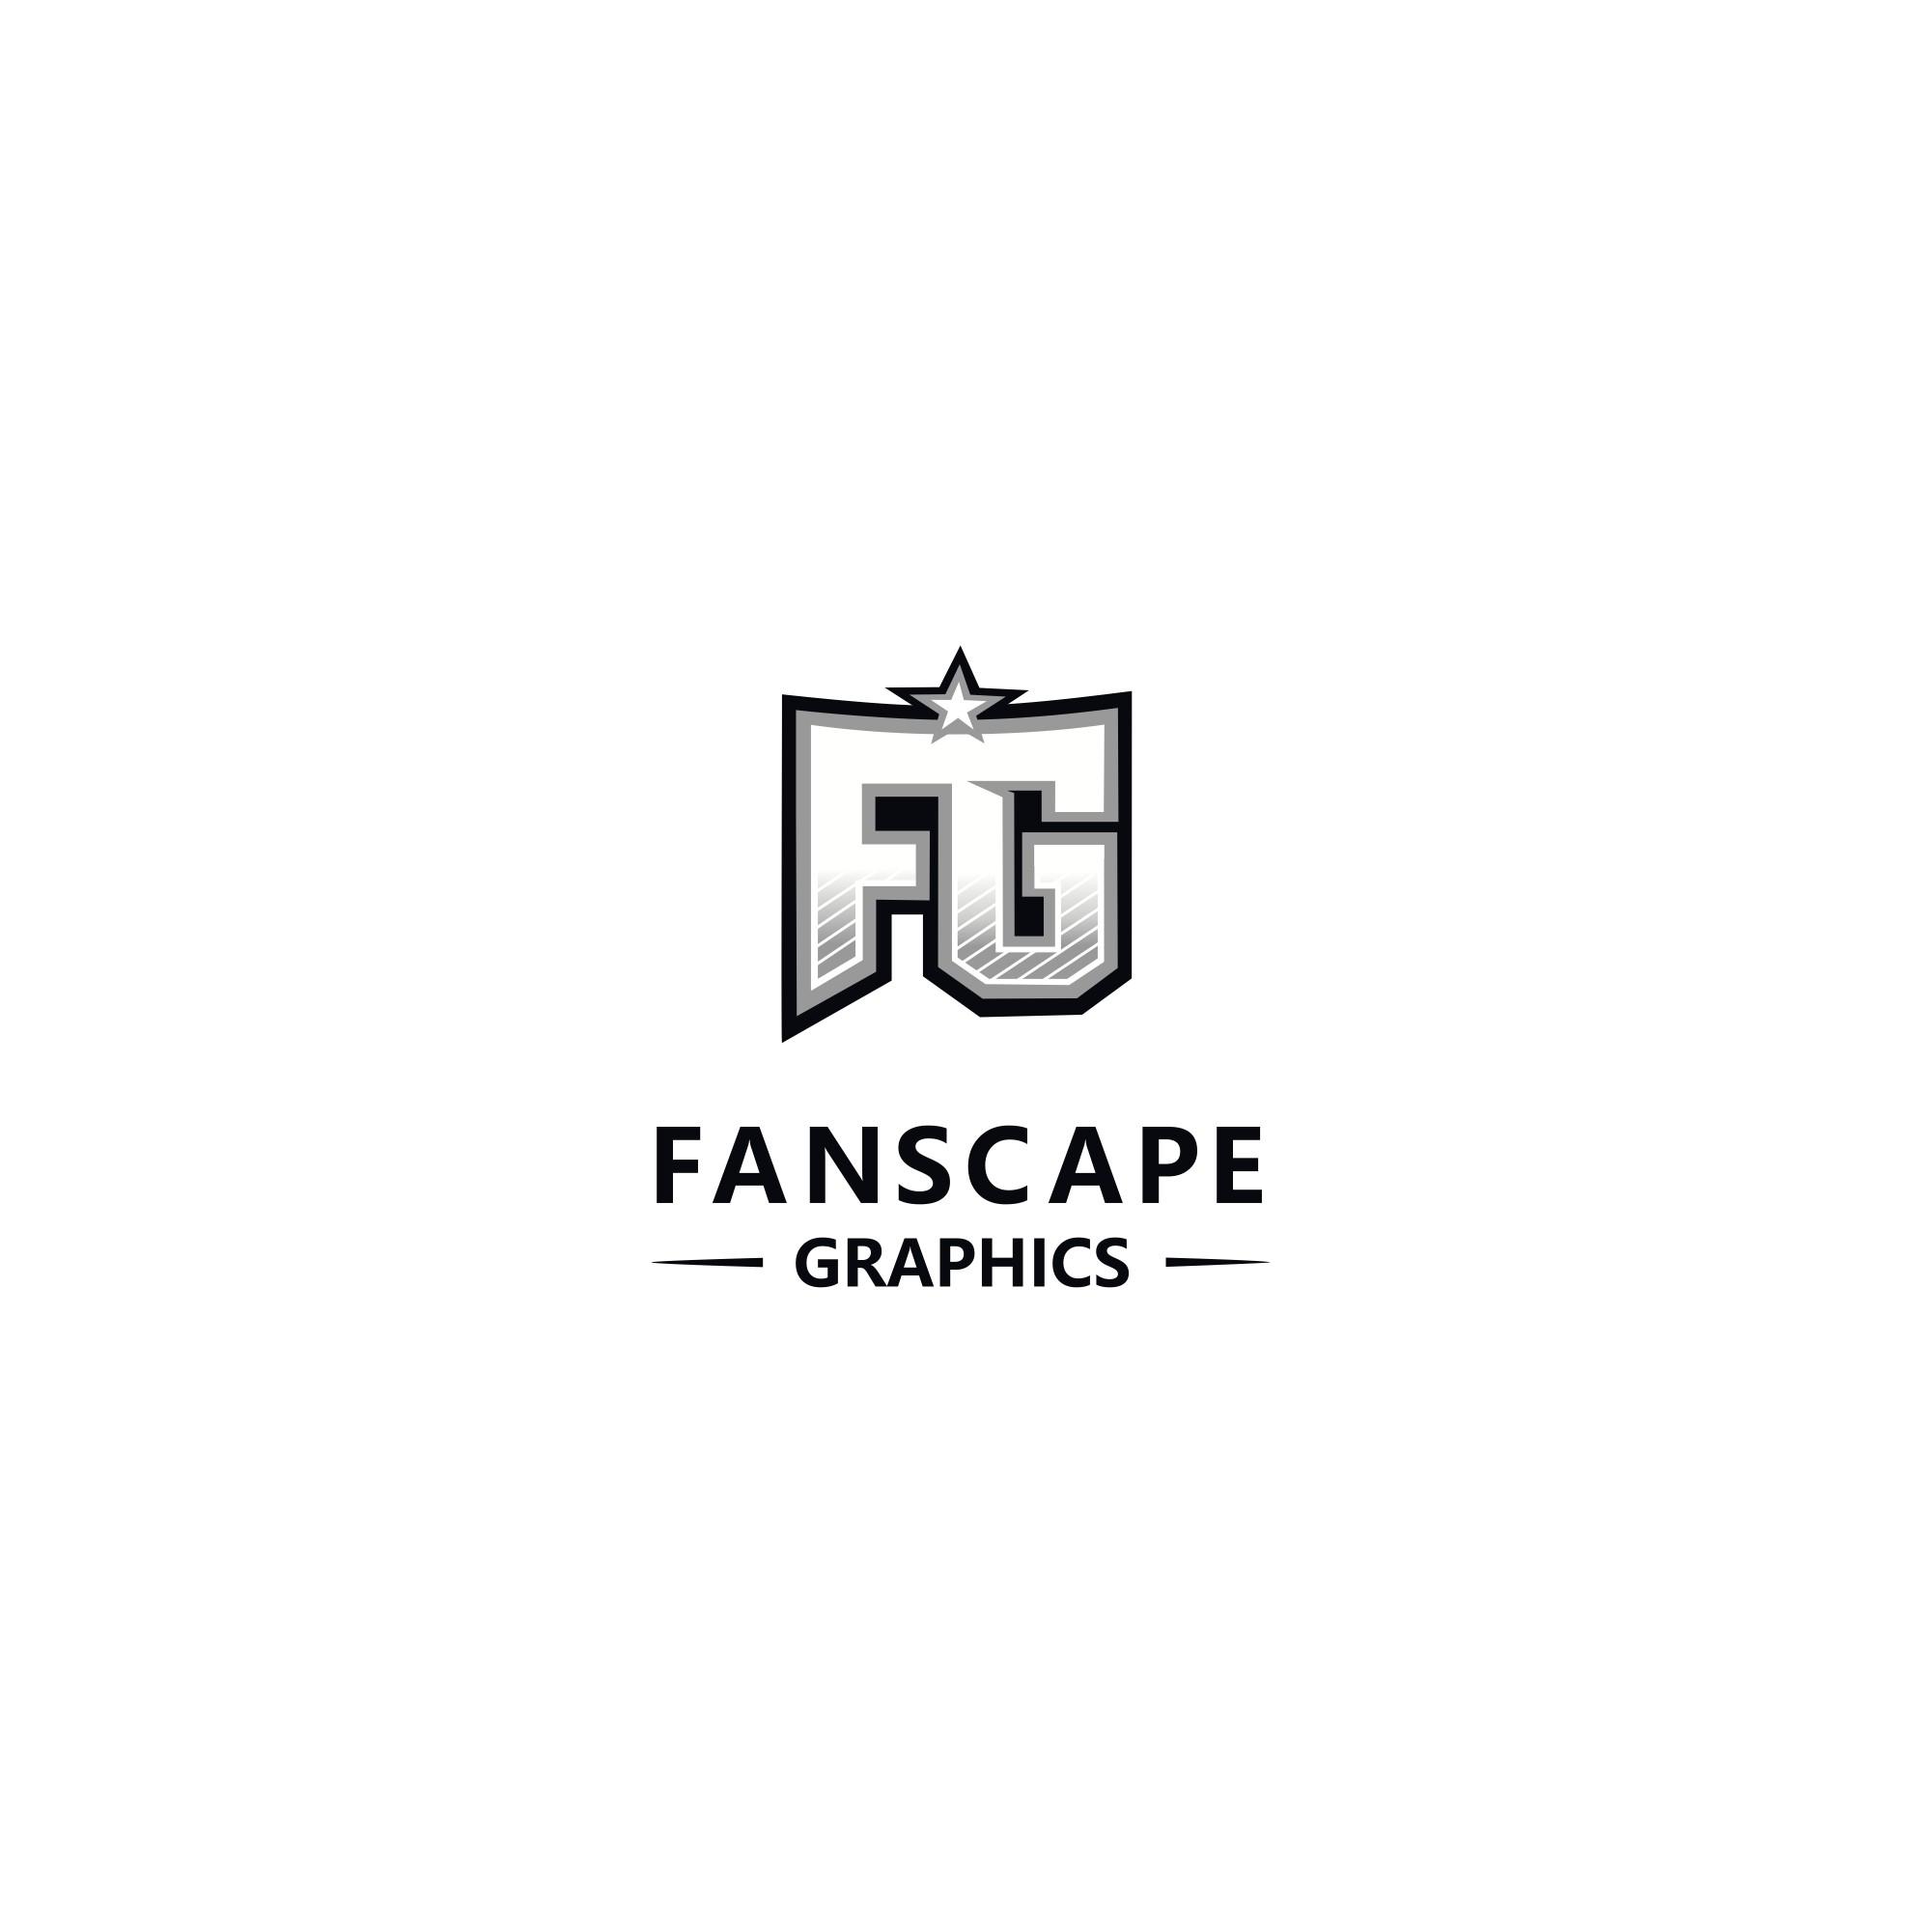 Design a HS/Collegiate Themed logo for Fanscape Graphics